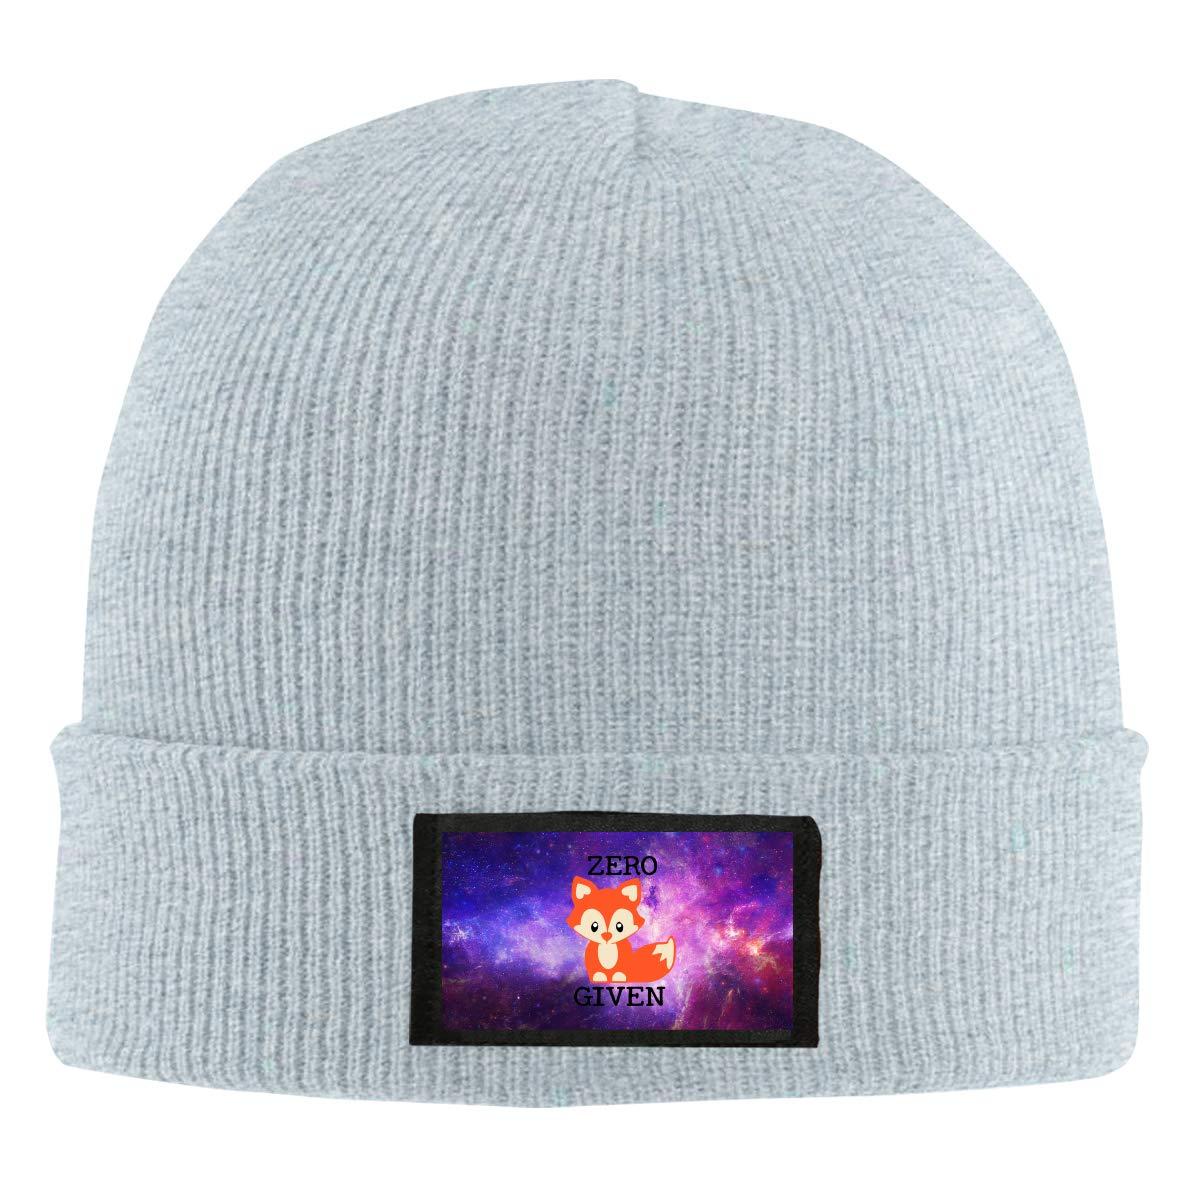 Zero Fox Given Winter Beanie Hat Knit Skull Cap for Men /& Women